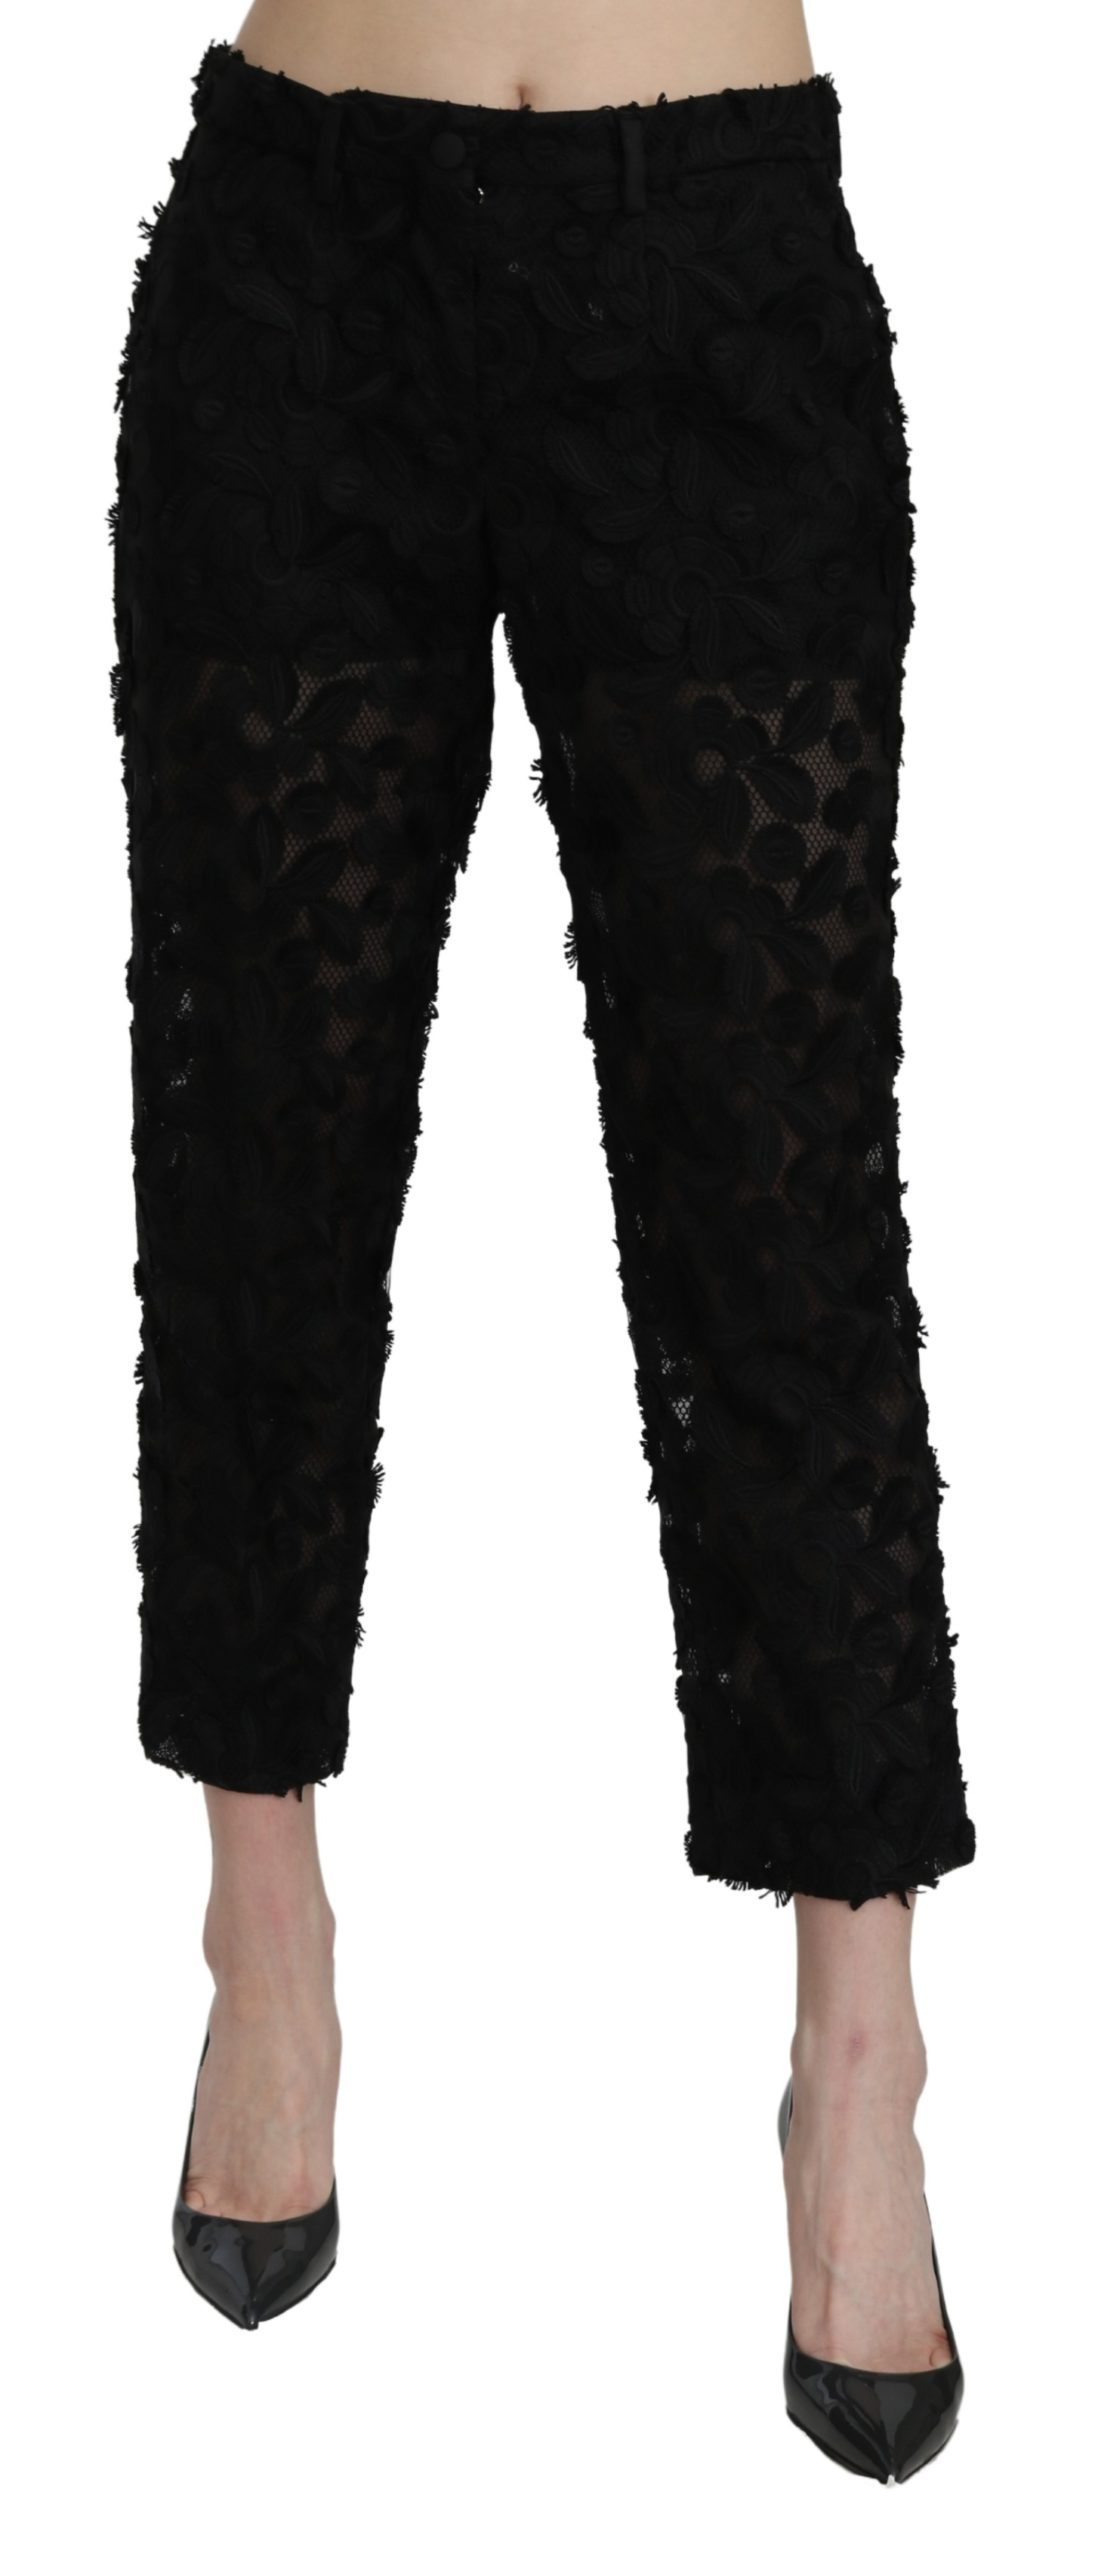 Dolce & Gabbana Women's Lace Straight High Waist Trouser Black PAN71061 - IT38|XS